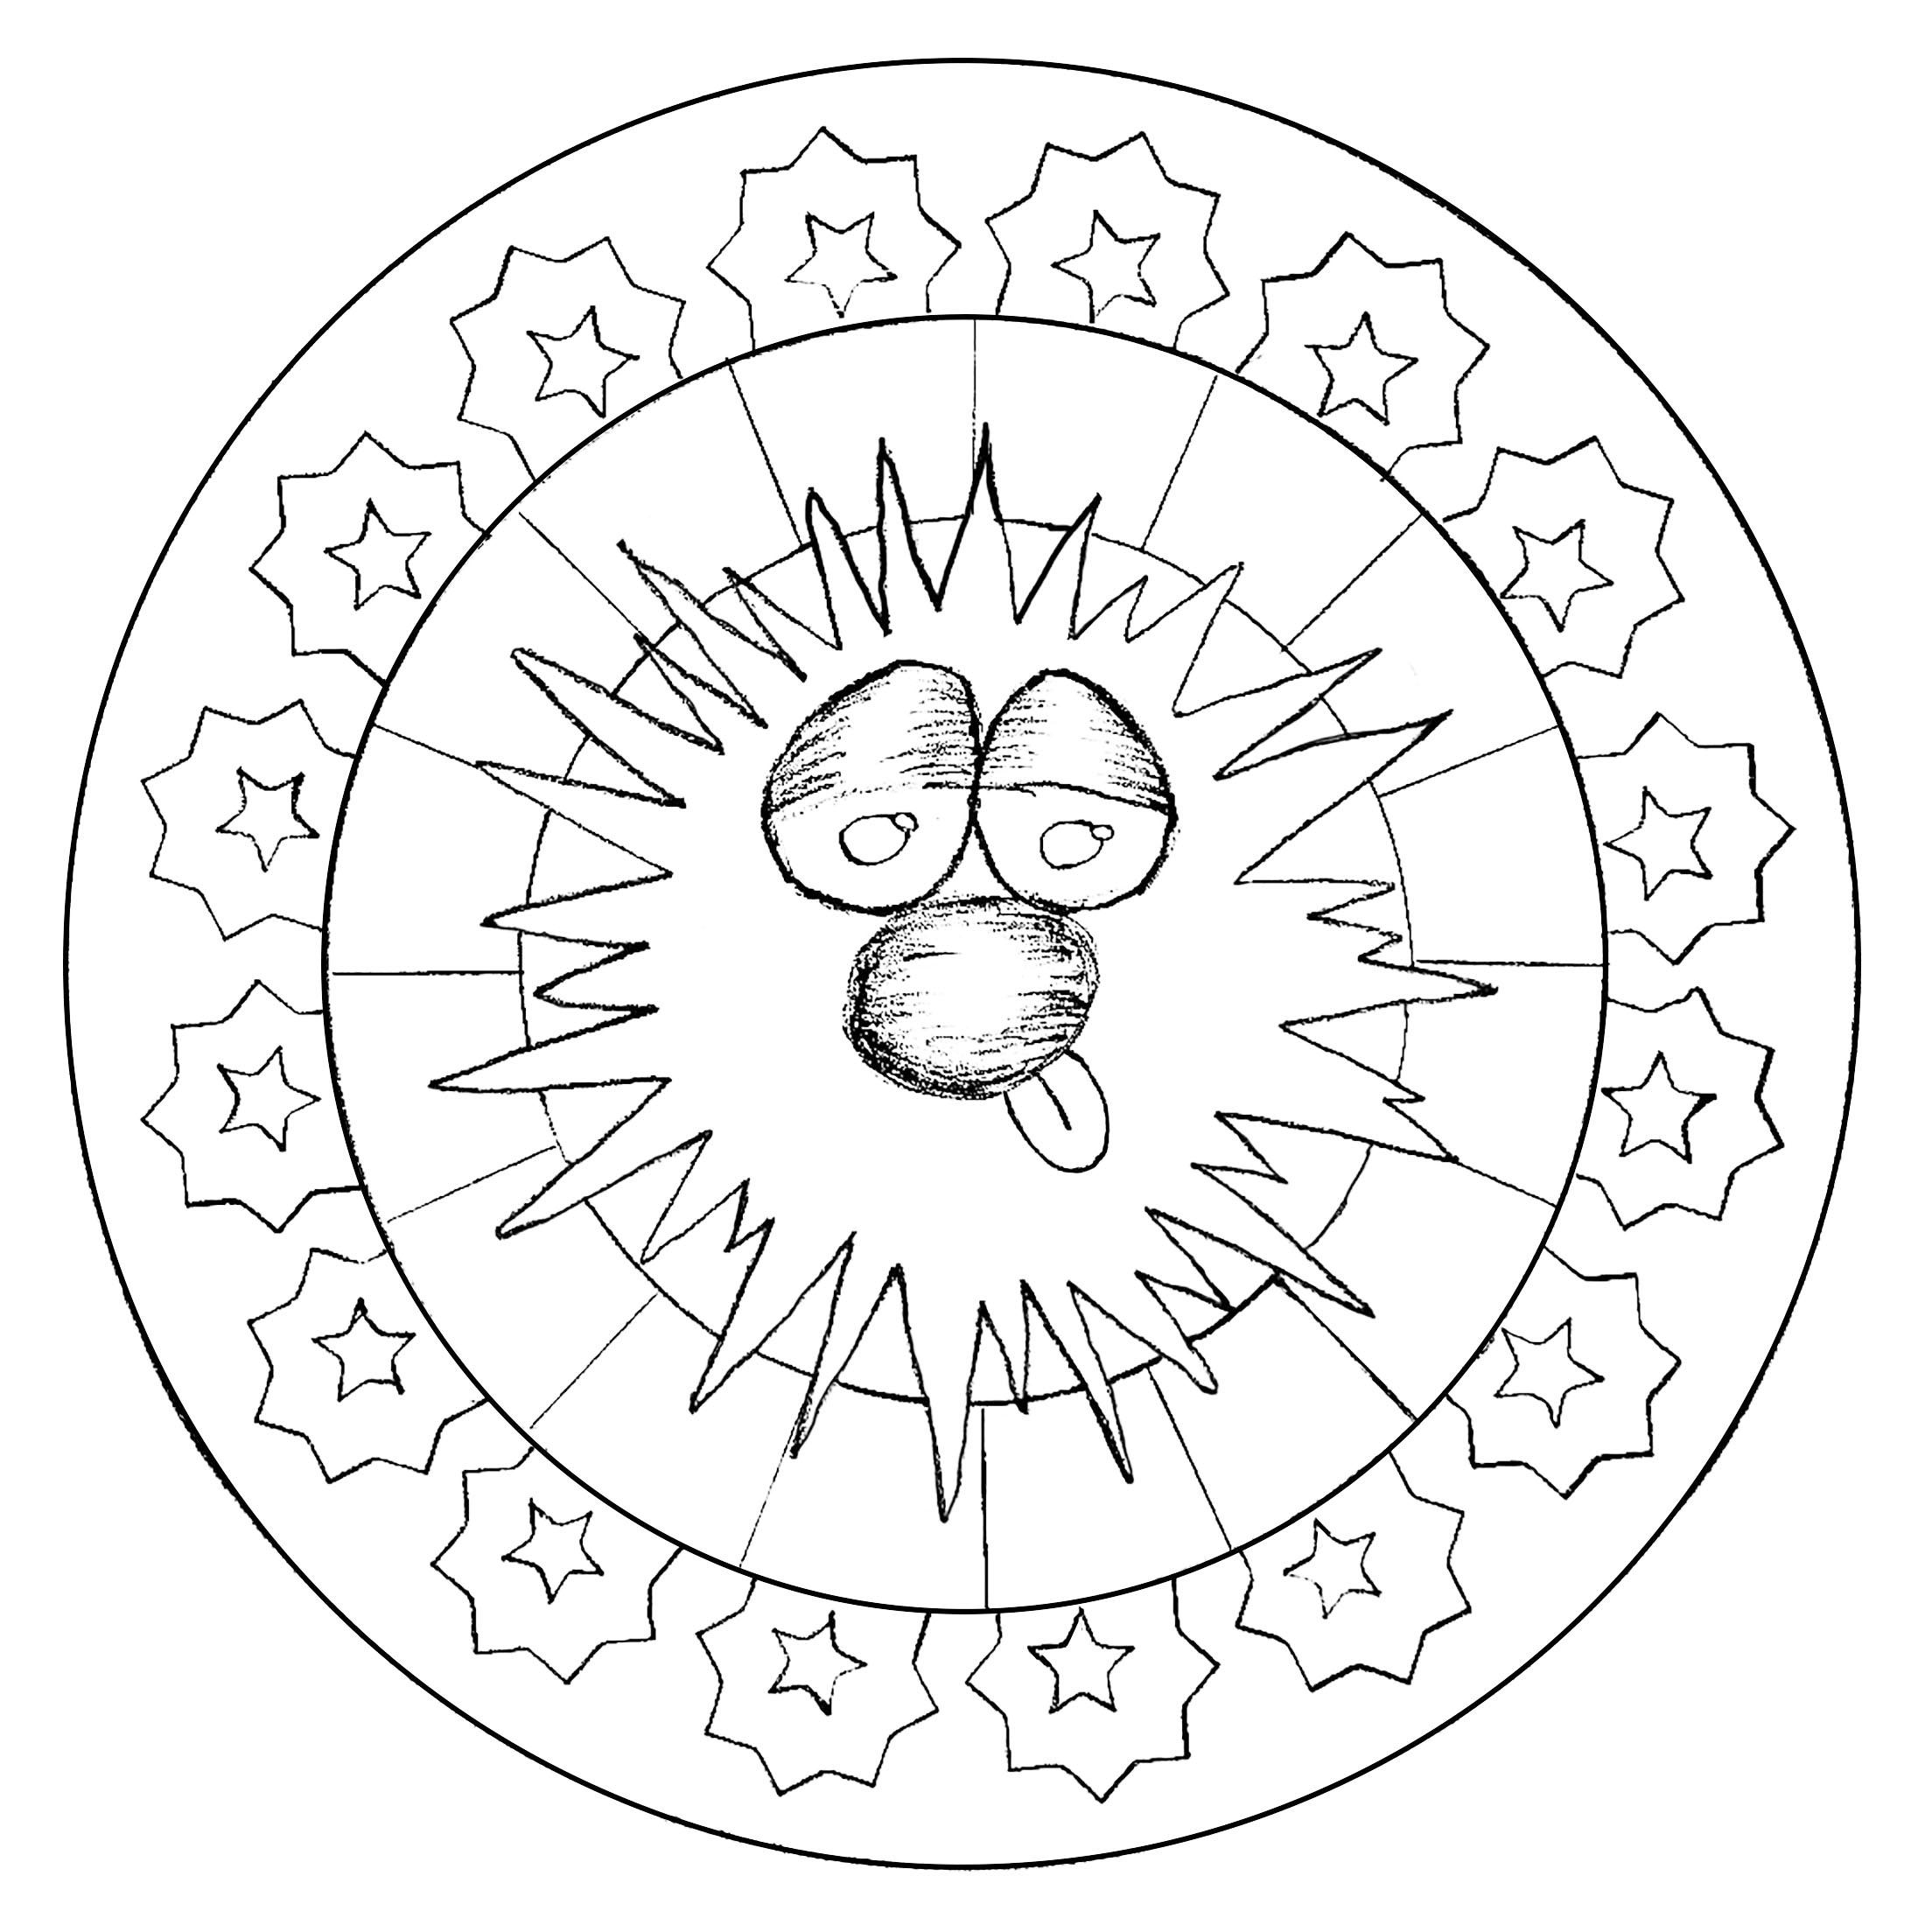 Mandala constitué d'un visage marrant